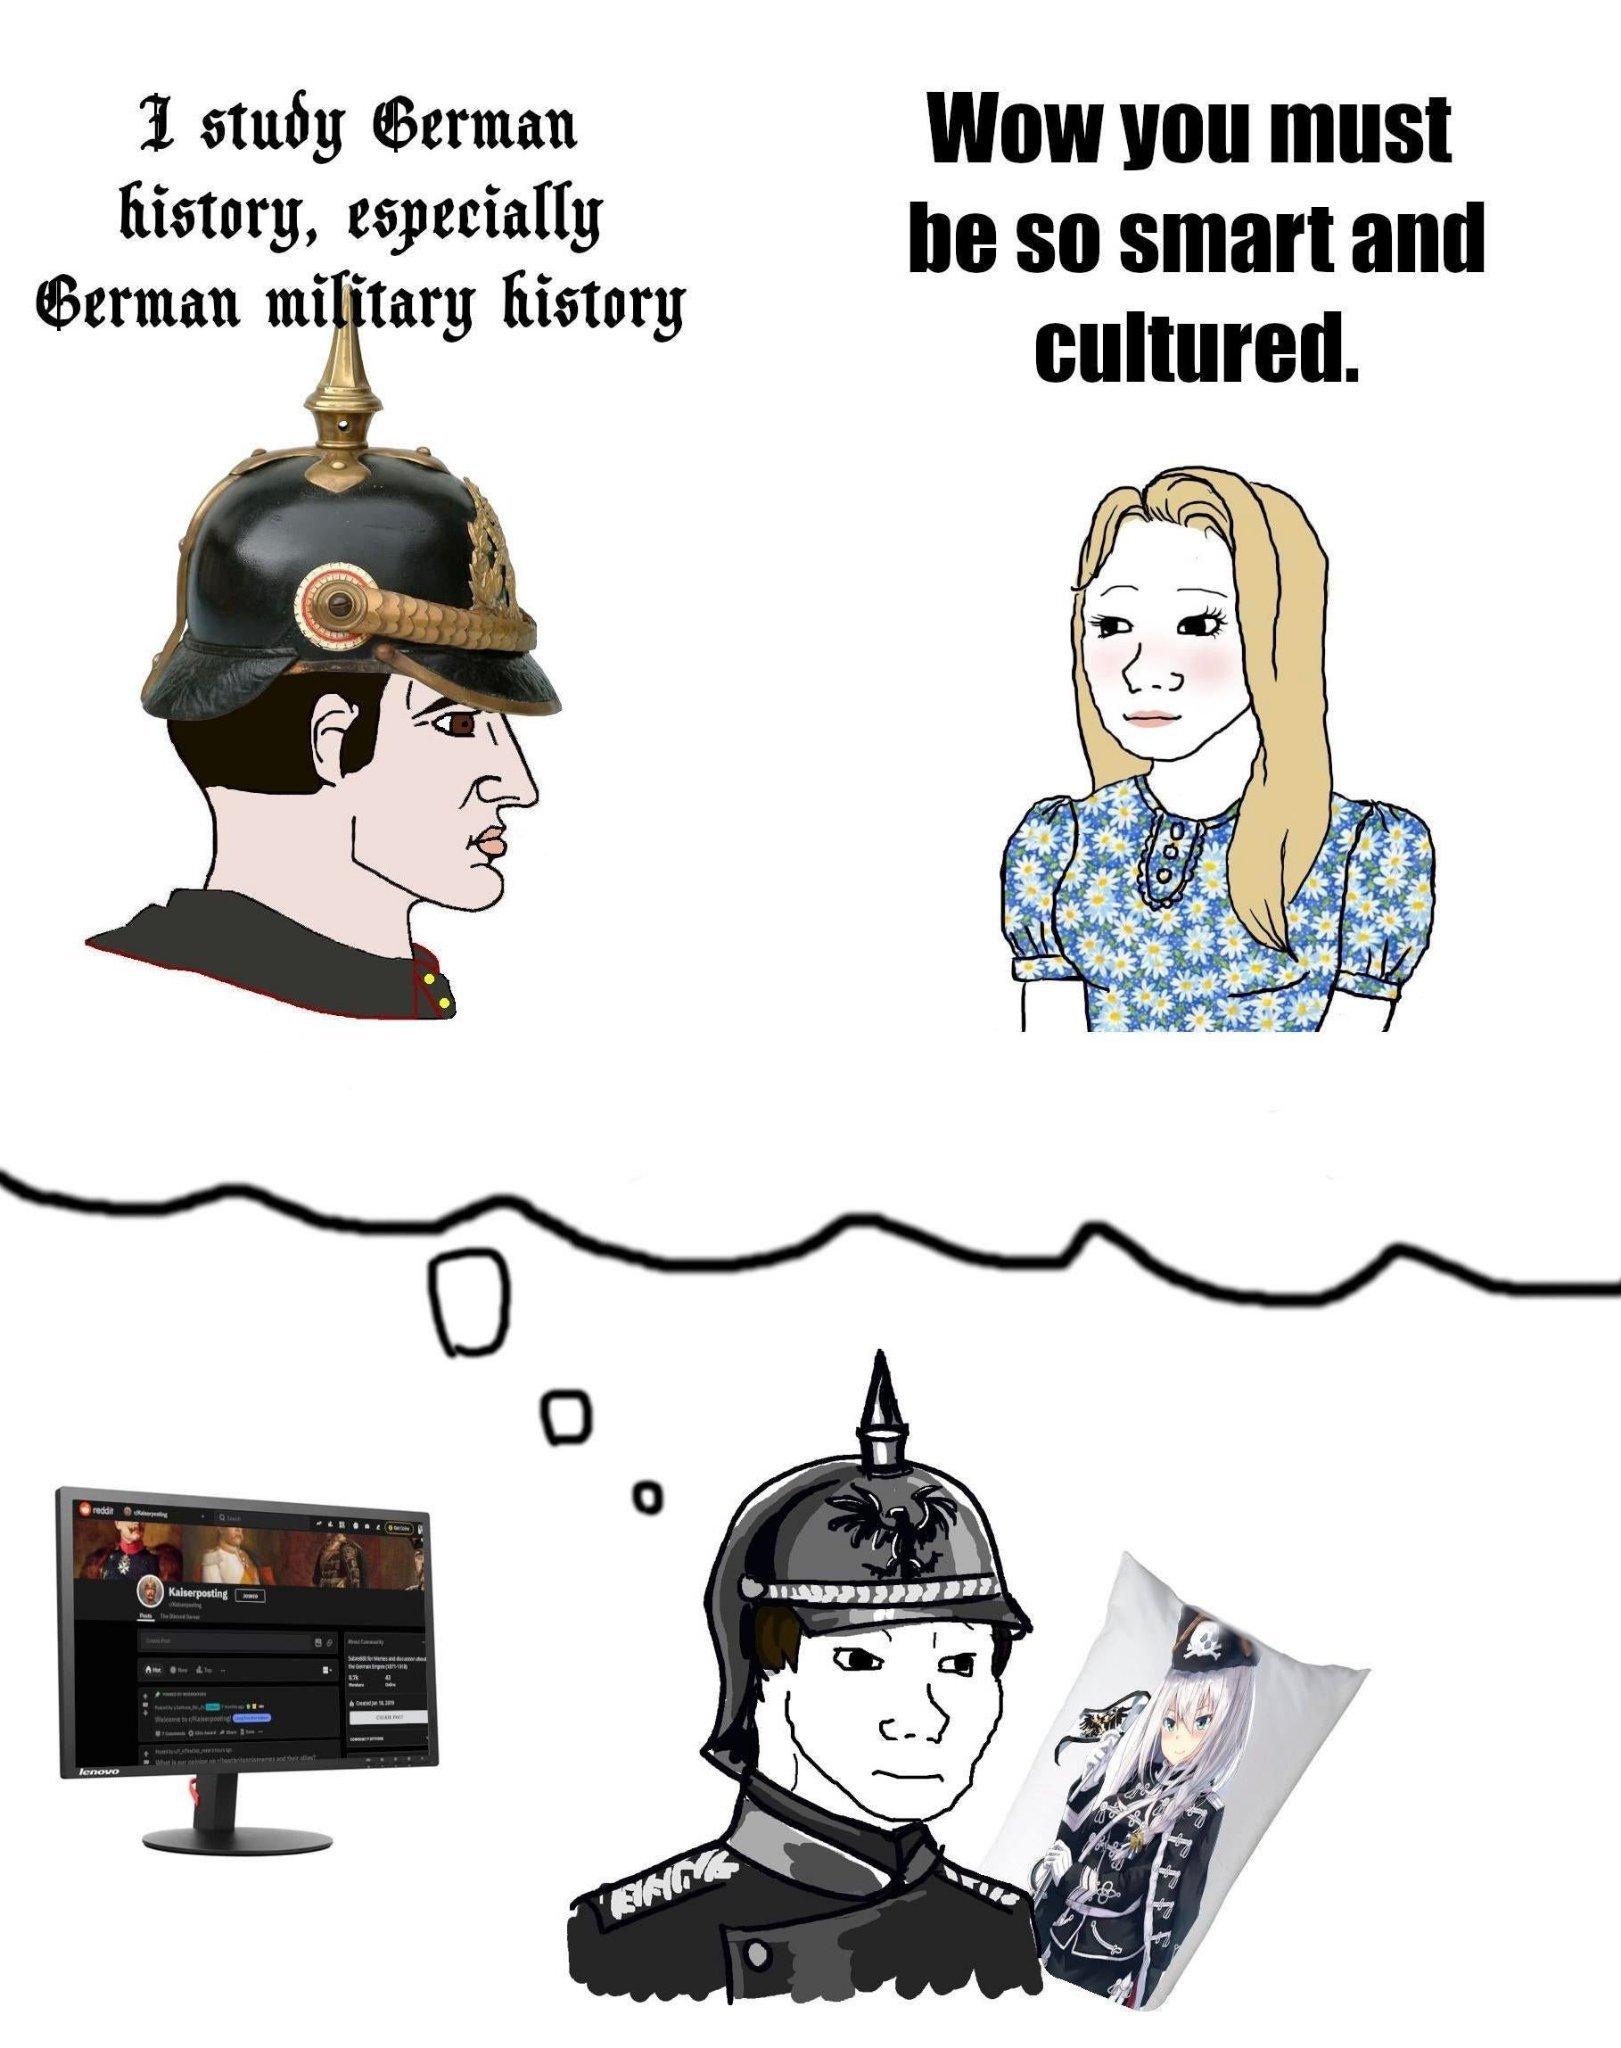 Enters /pol/ once - meme